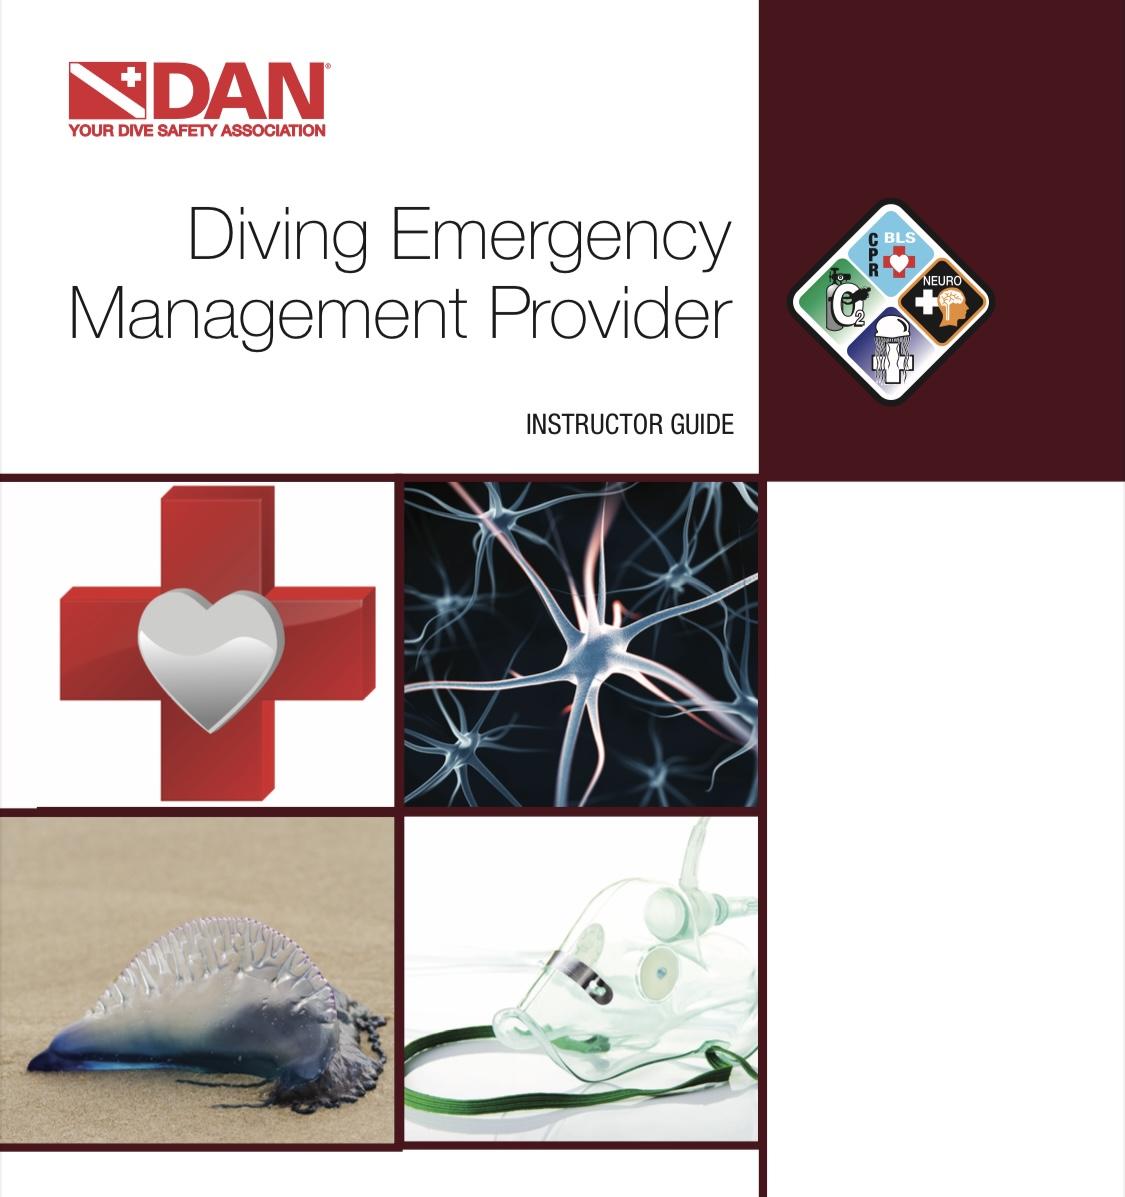 DAN Diving Emergency Management Provider